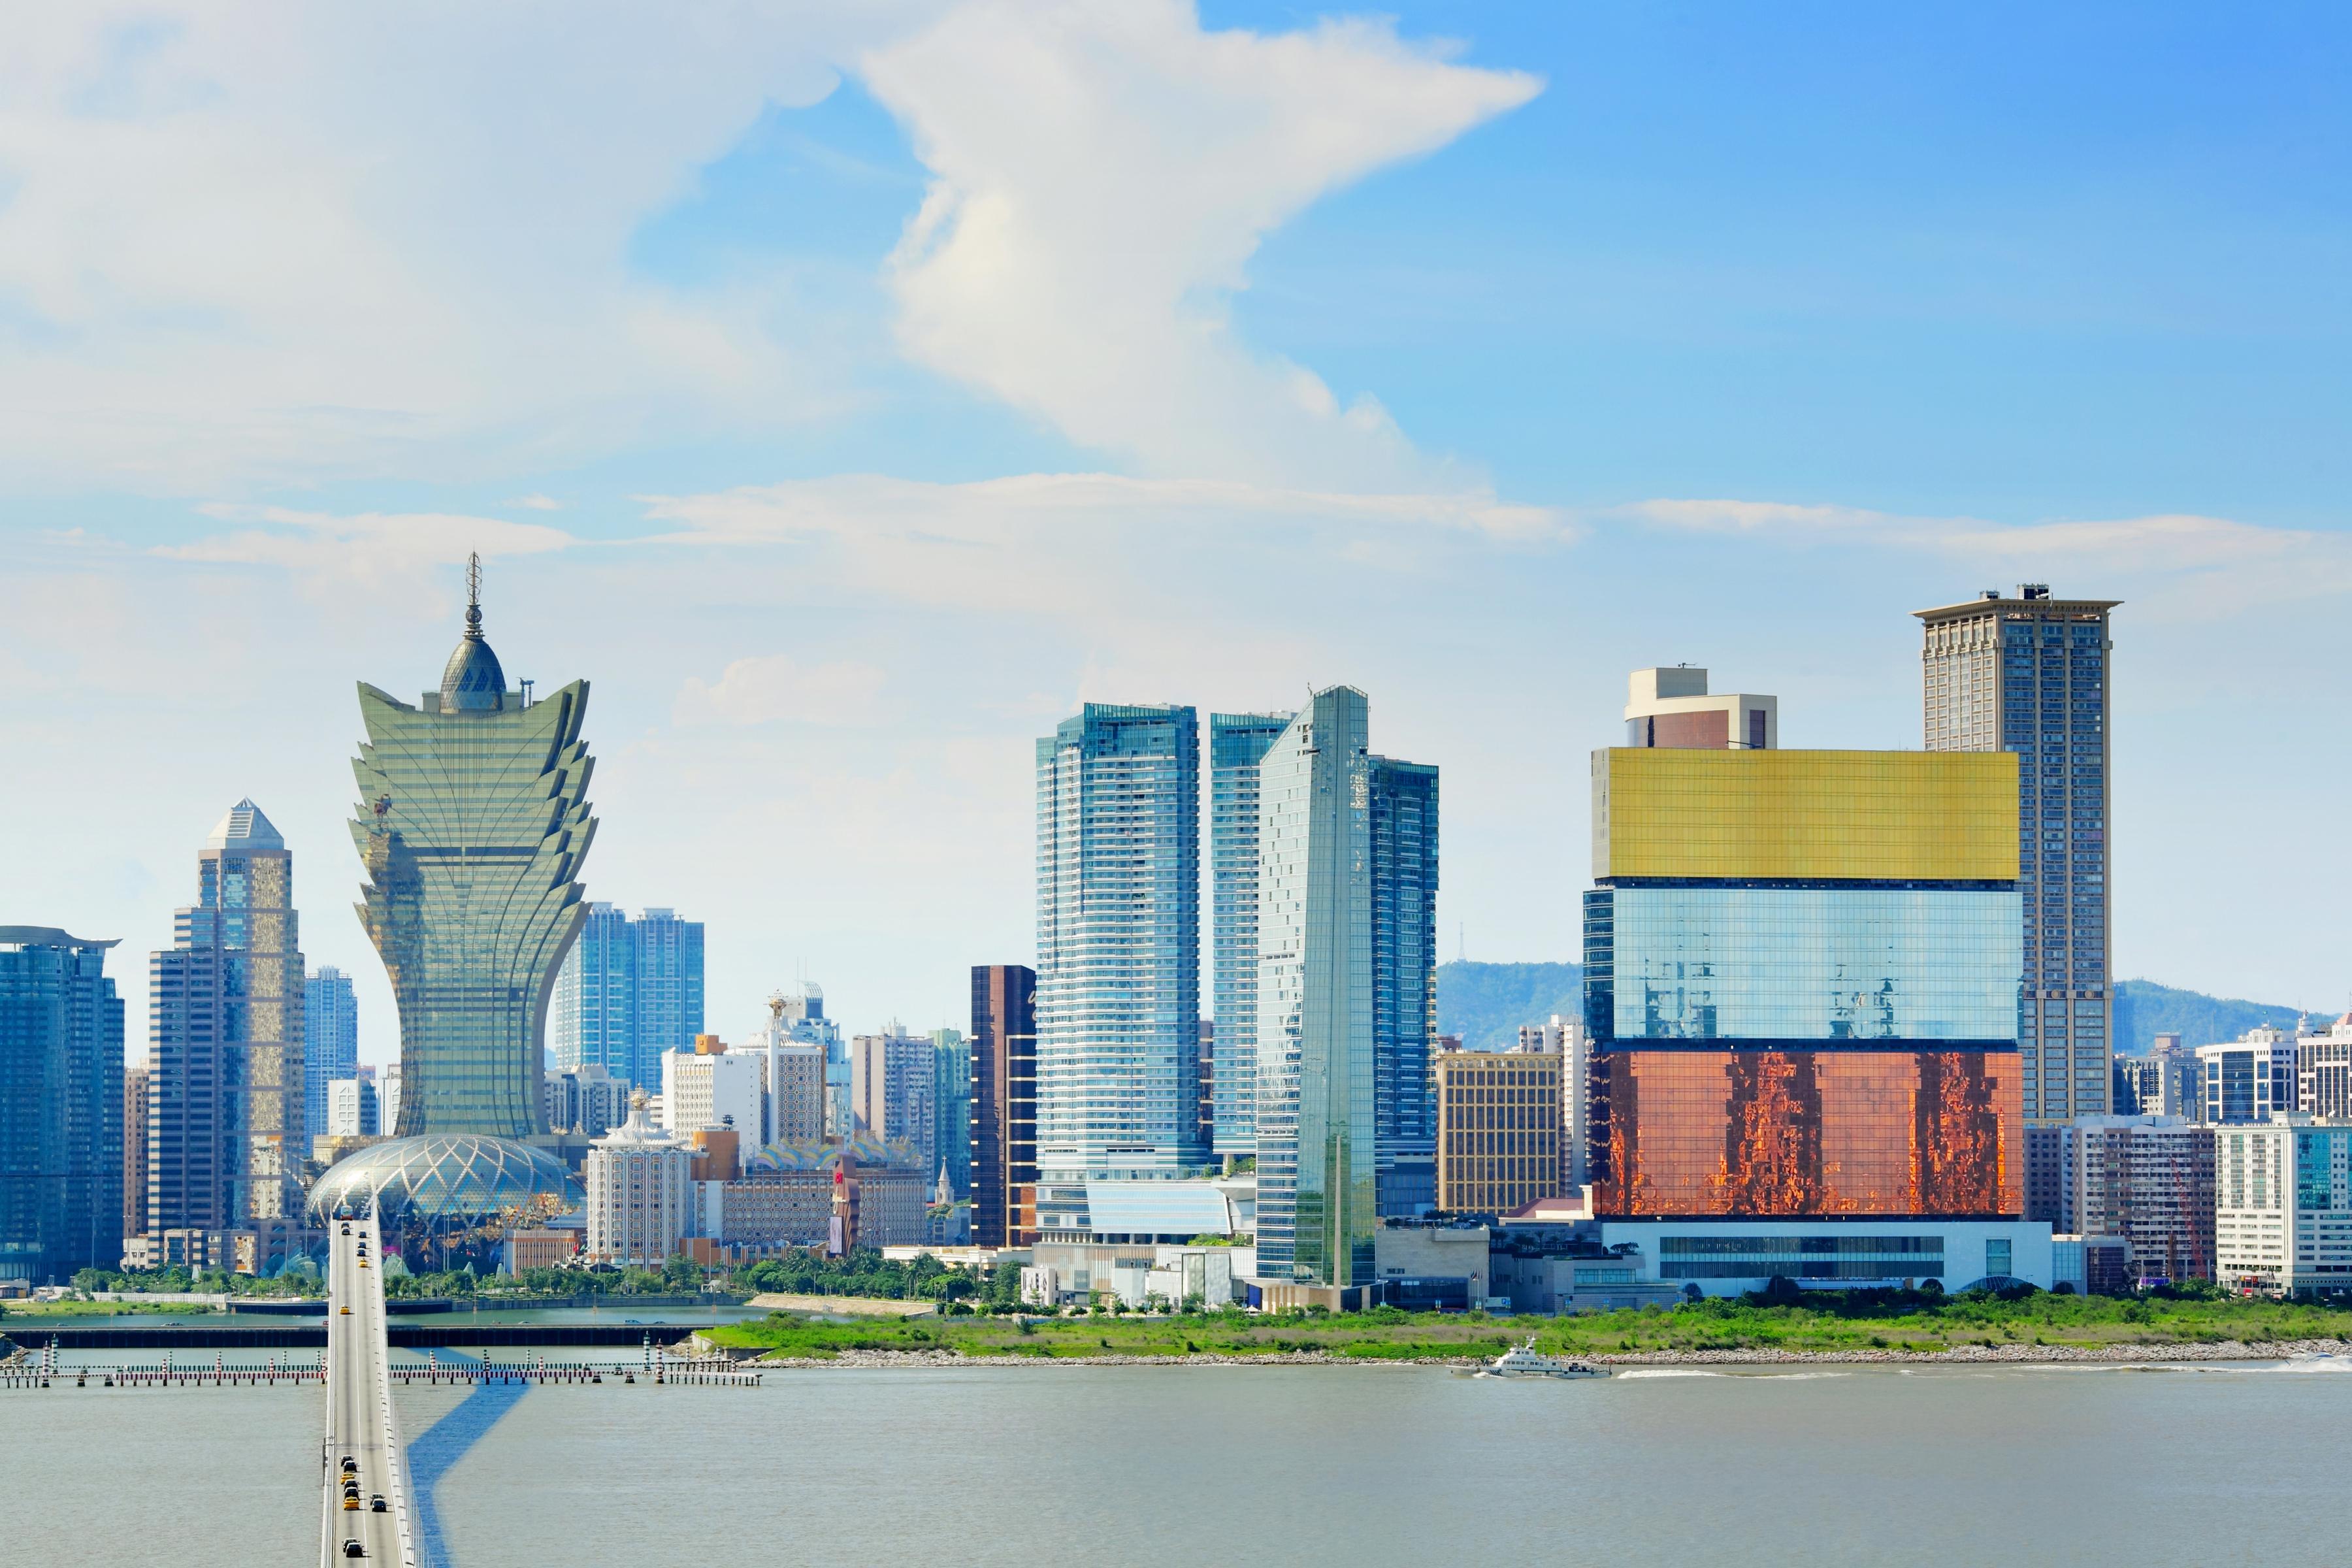 Macau Peninsula skyline.